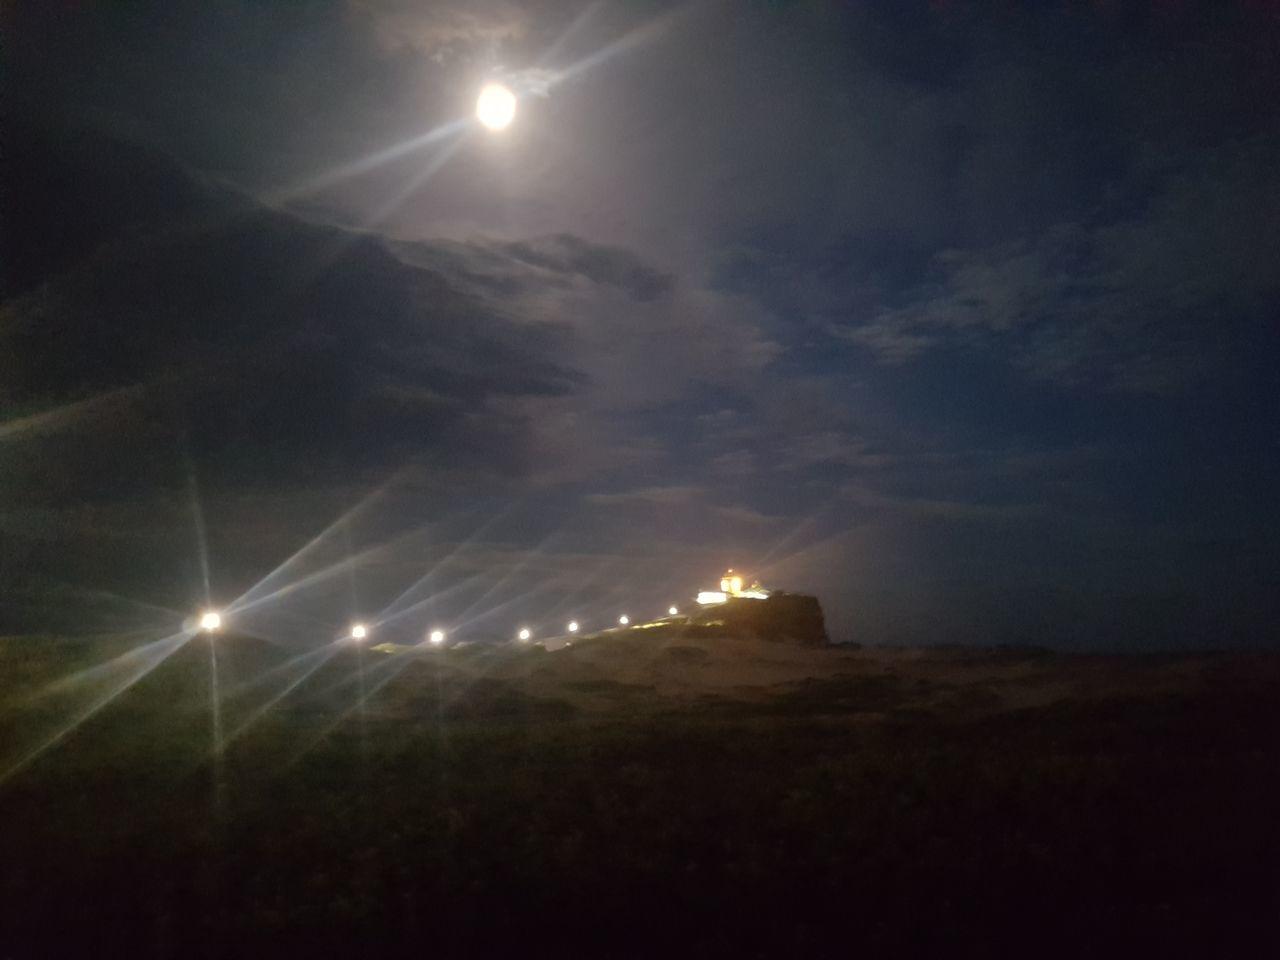 Night Sky Illuminated Outdoors Cloud - Sky No People Scenics Nature Beauty In Nature Moon Stadium Star - Space Newcastle Summer ☀ Natural Phenomenon Astronomy